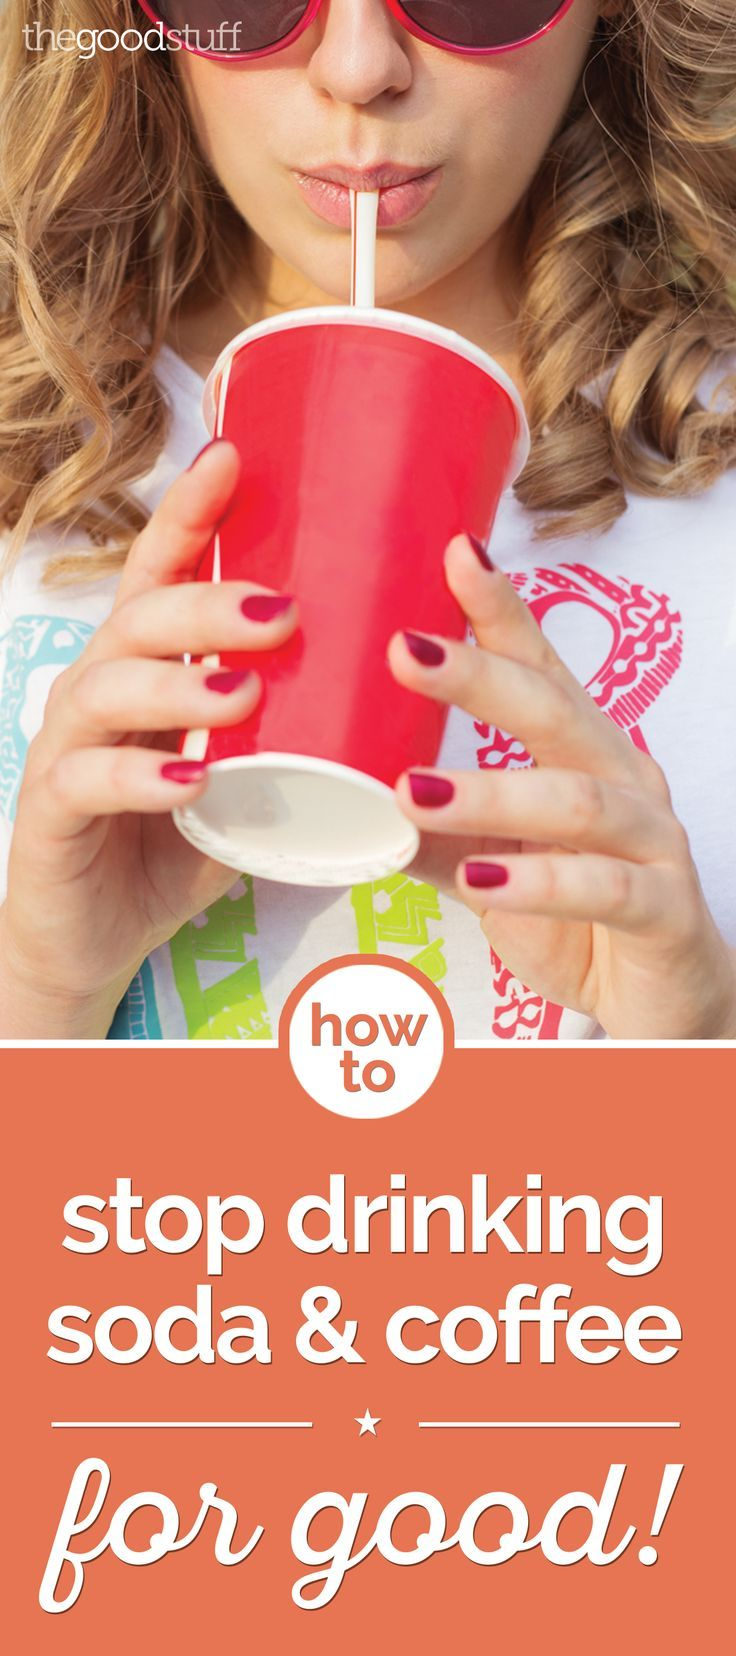 6 Foolproof Ways to Kick a CaffeineAddiction forecasting